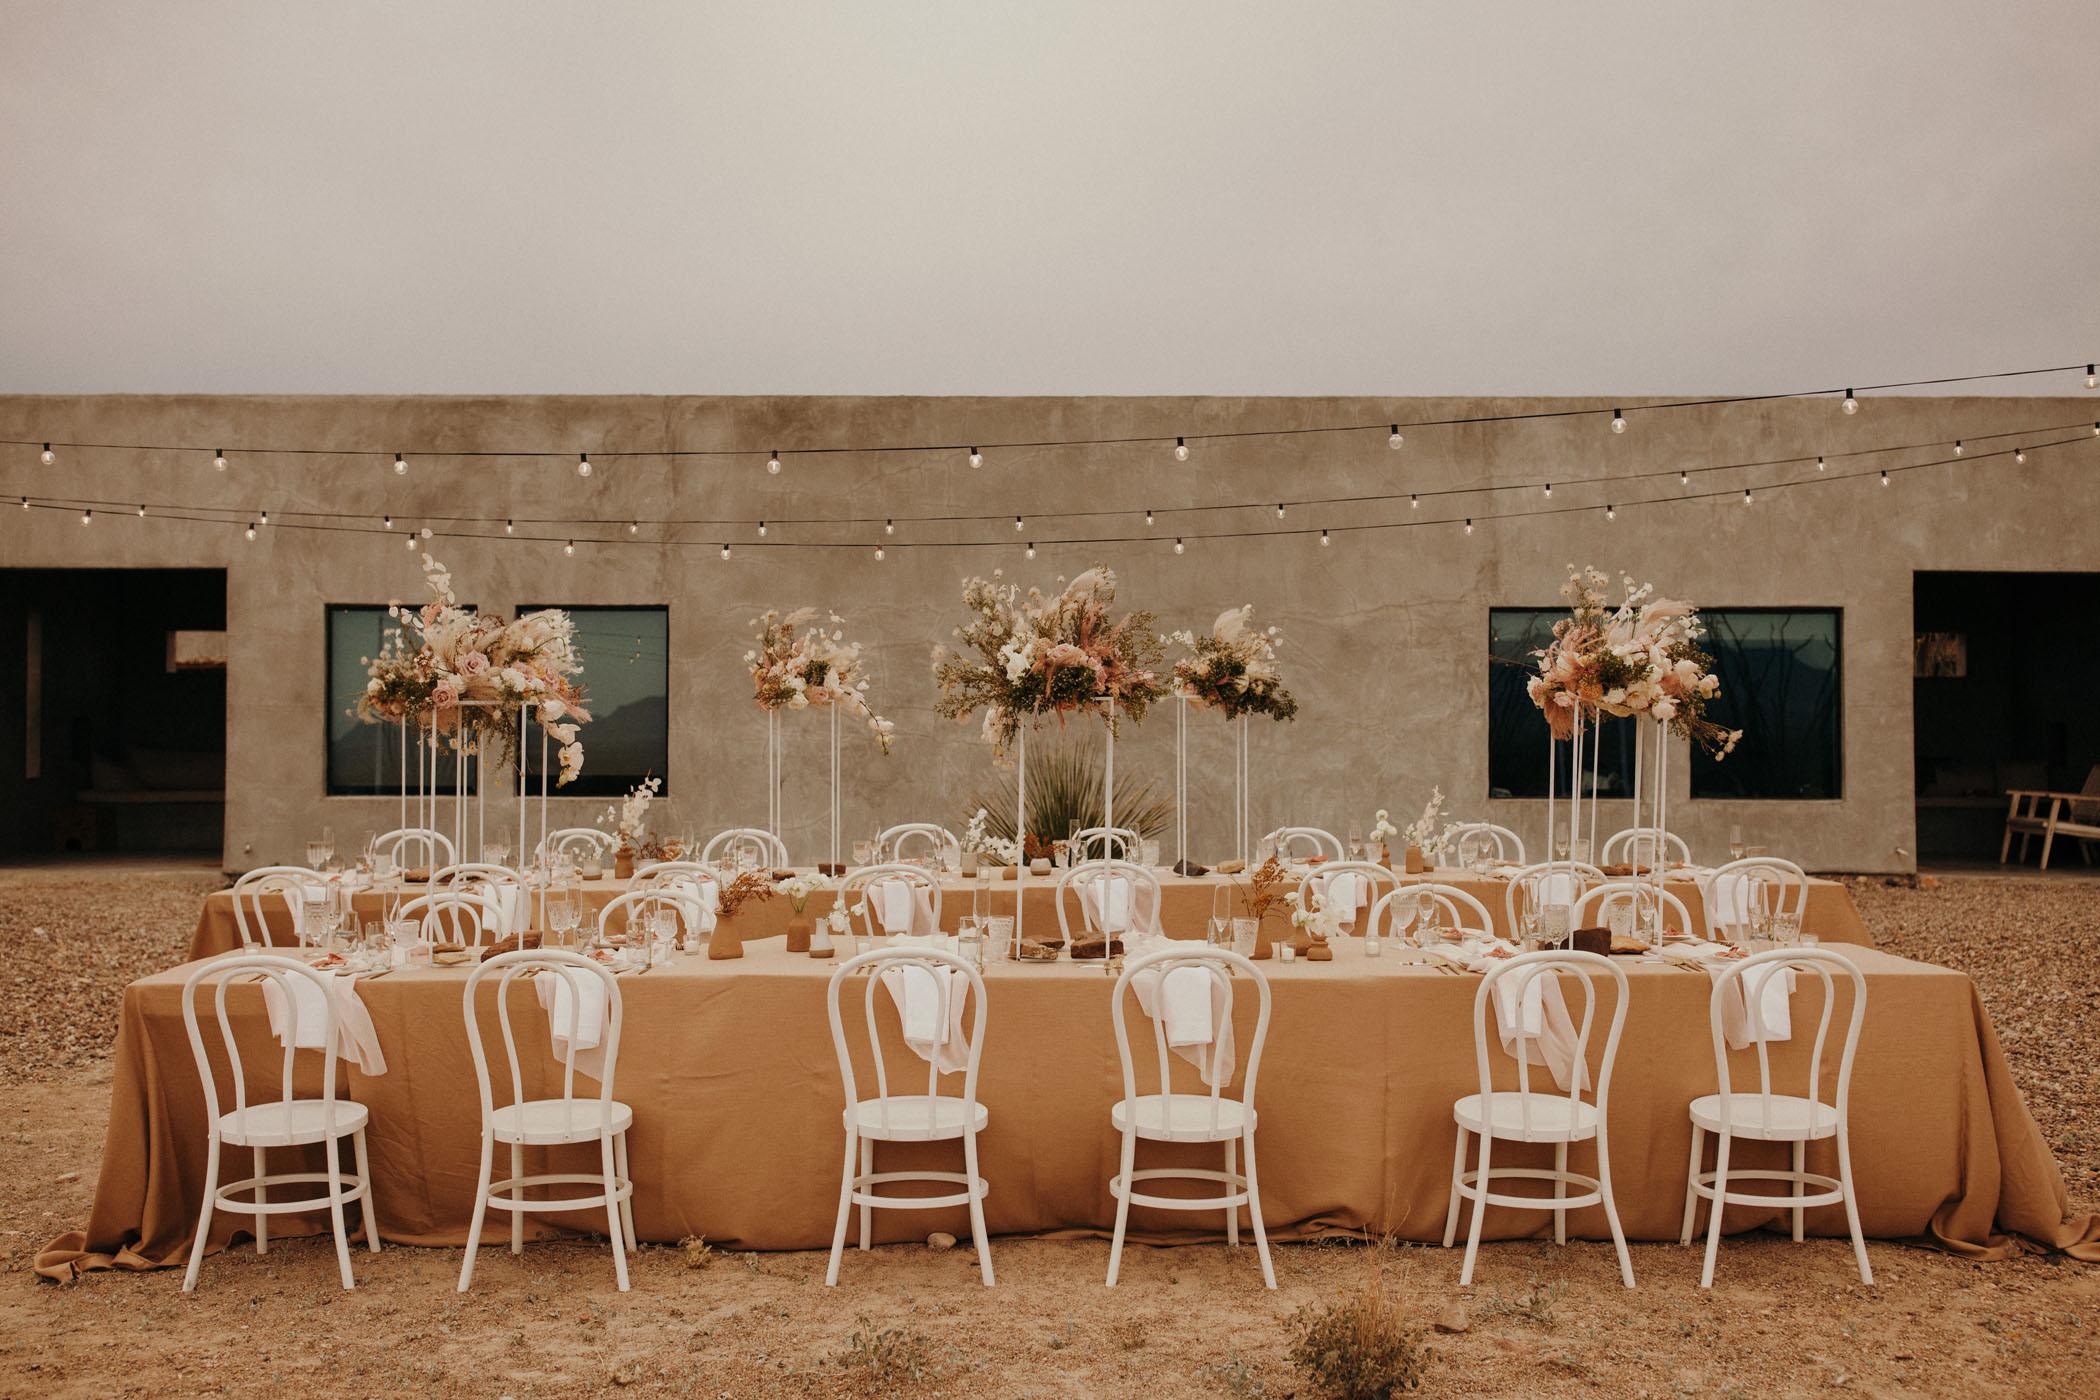 Modern Micro Wedding in the Texas Desert